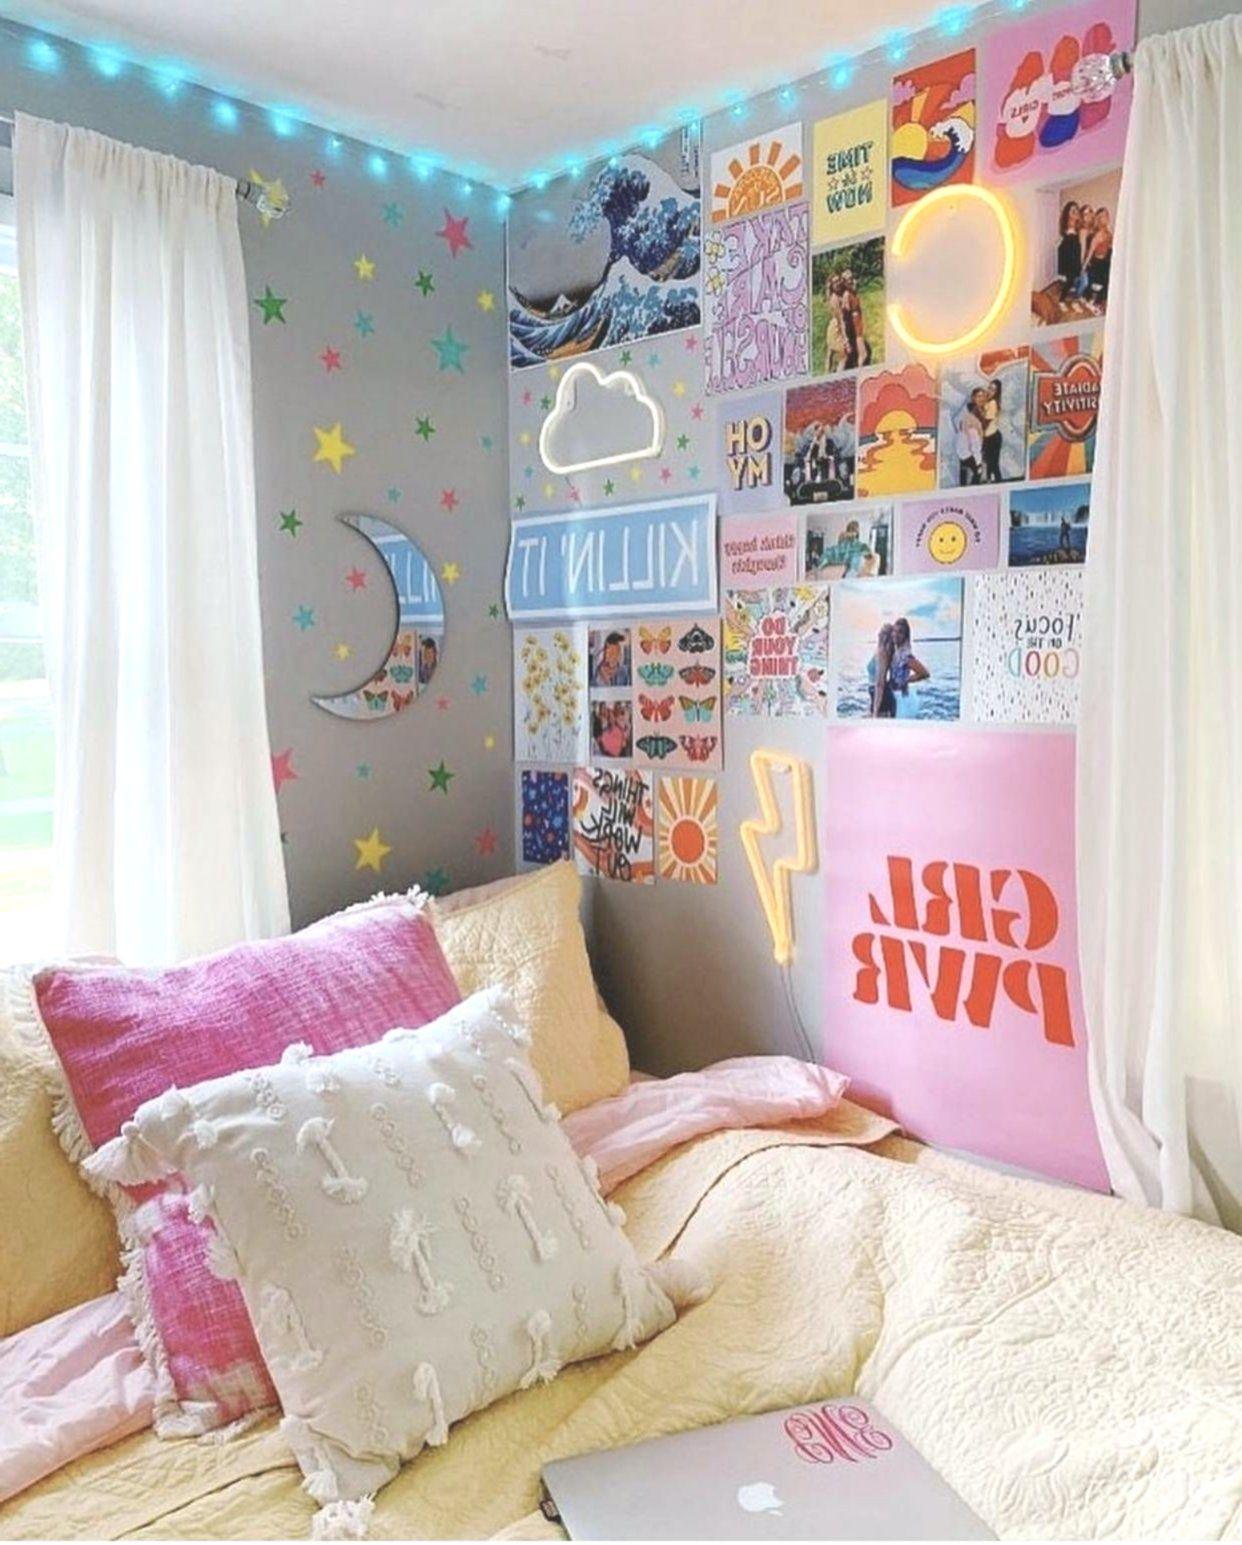 10 Vsco Bed Room Concepts For The Vsco Lady Bedroom Decor Design Room Ideas Bedroom Dorm Room Decor